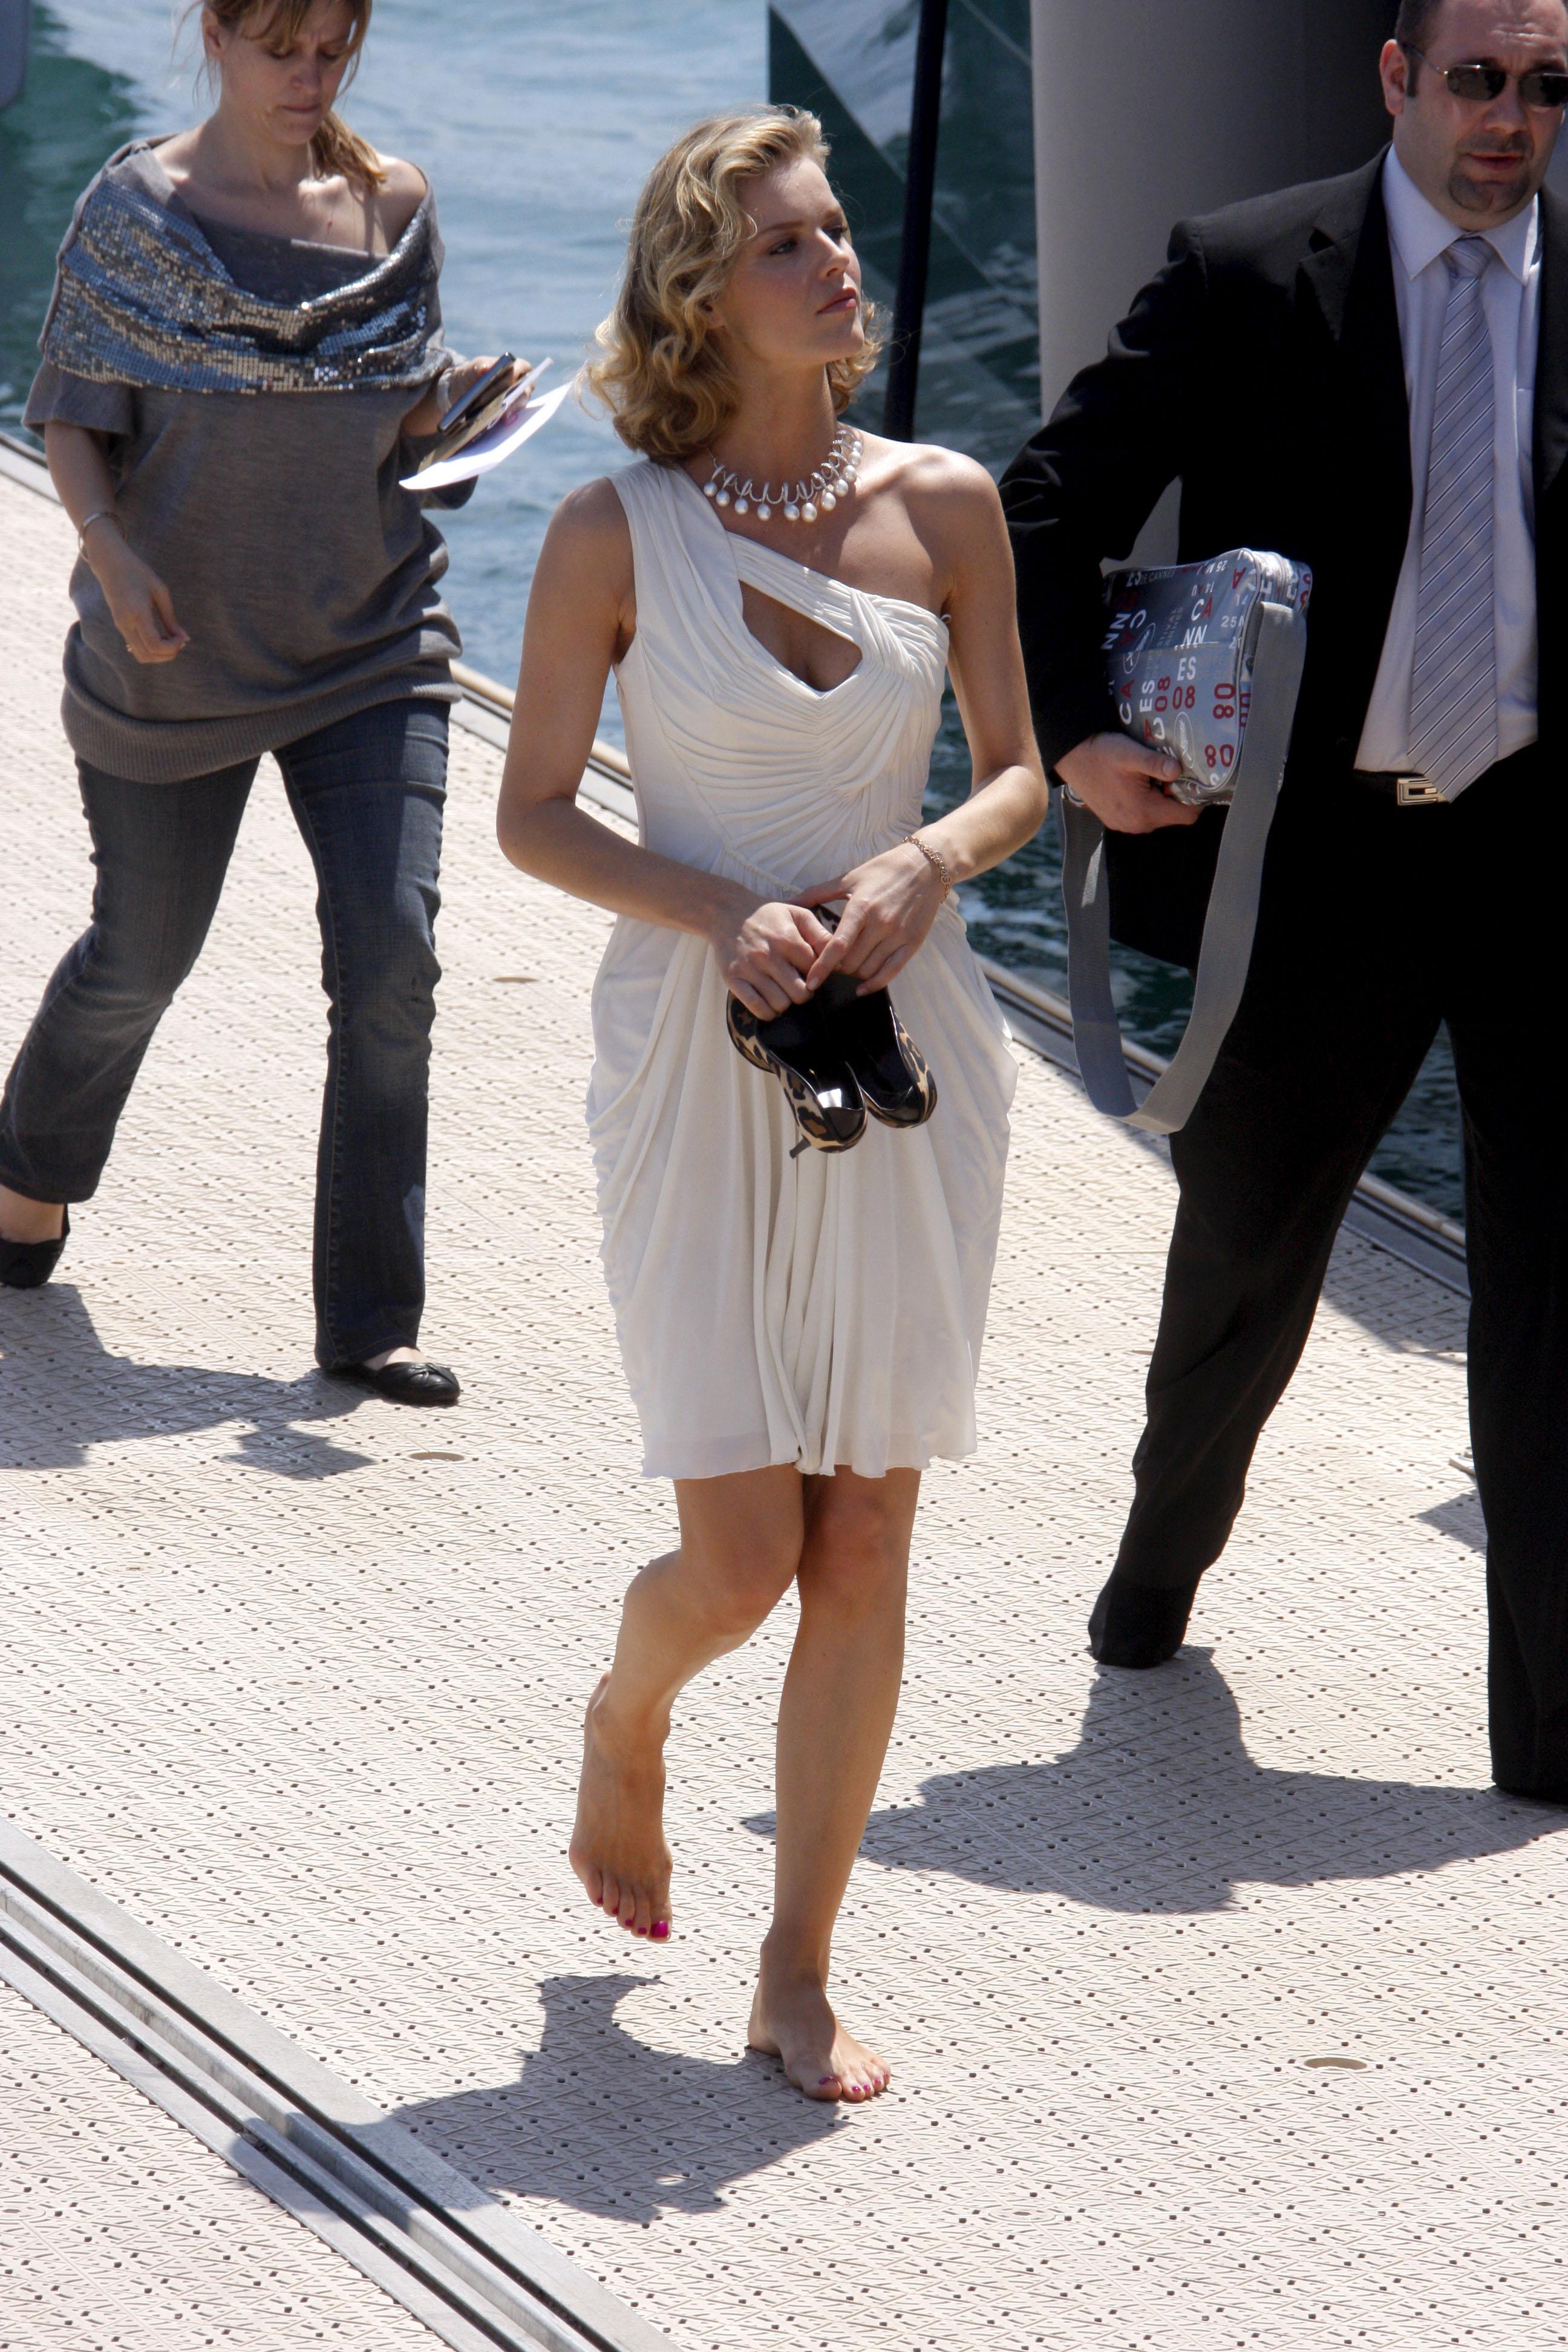 https://pics.wikifeet.com/Eva-Herzigova-Feet-304103.jpg